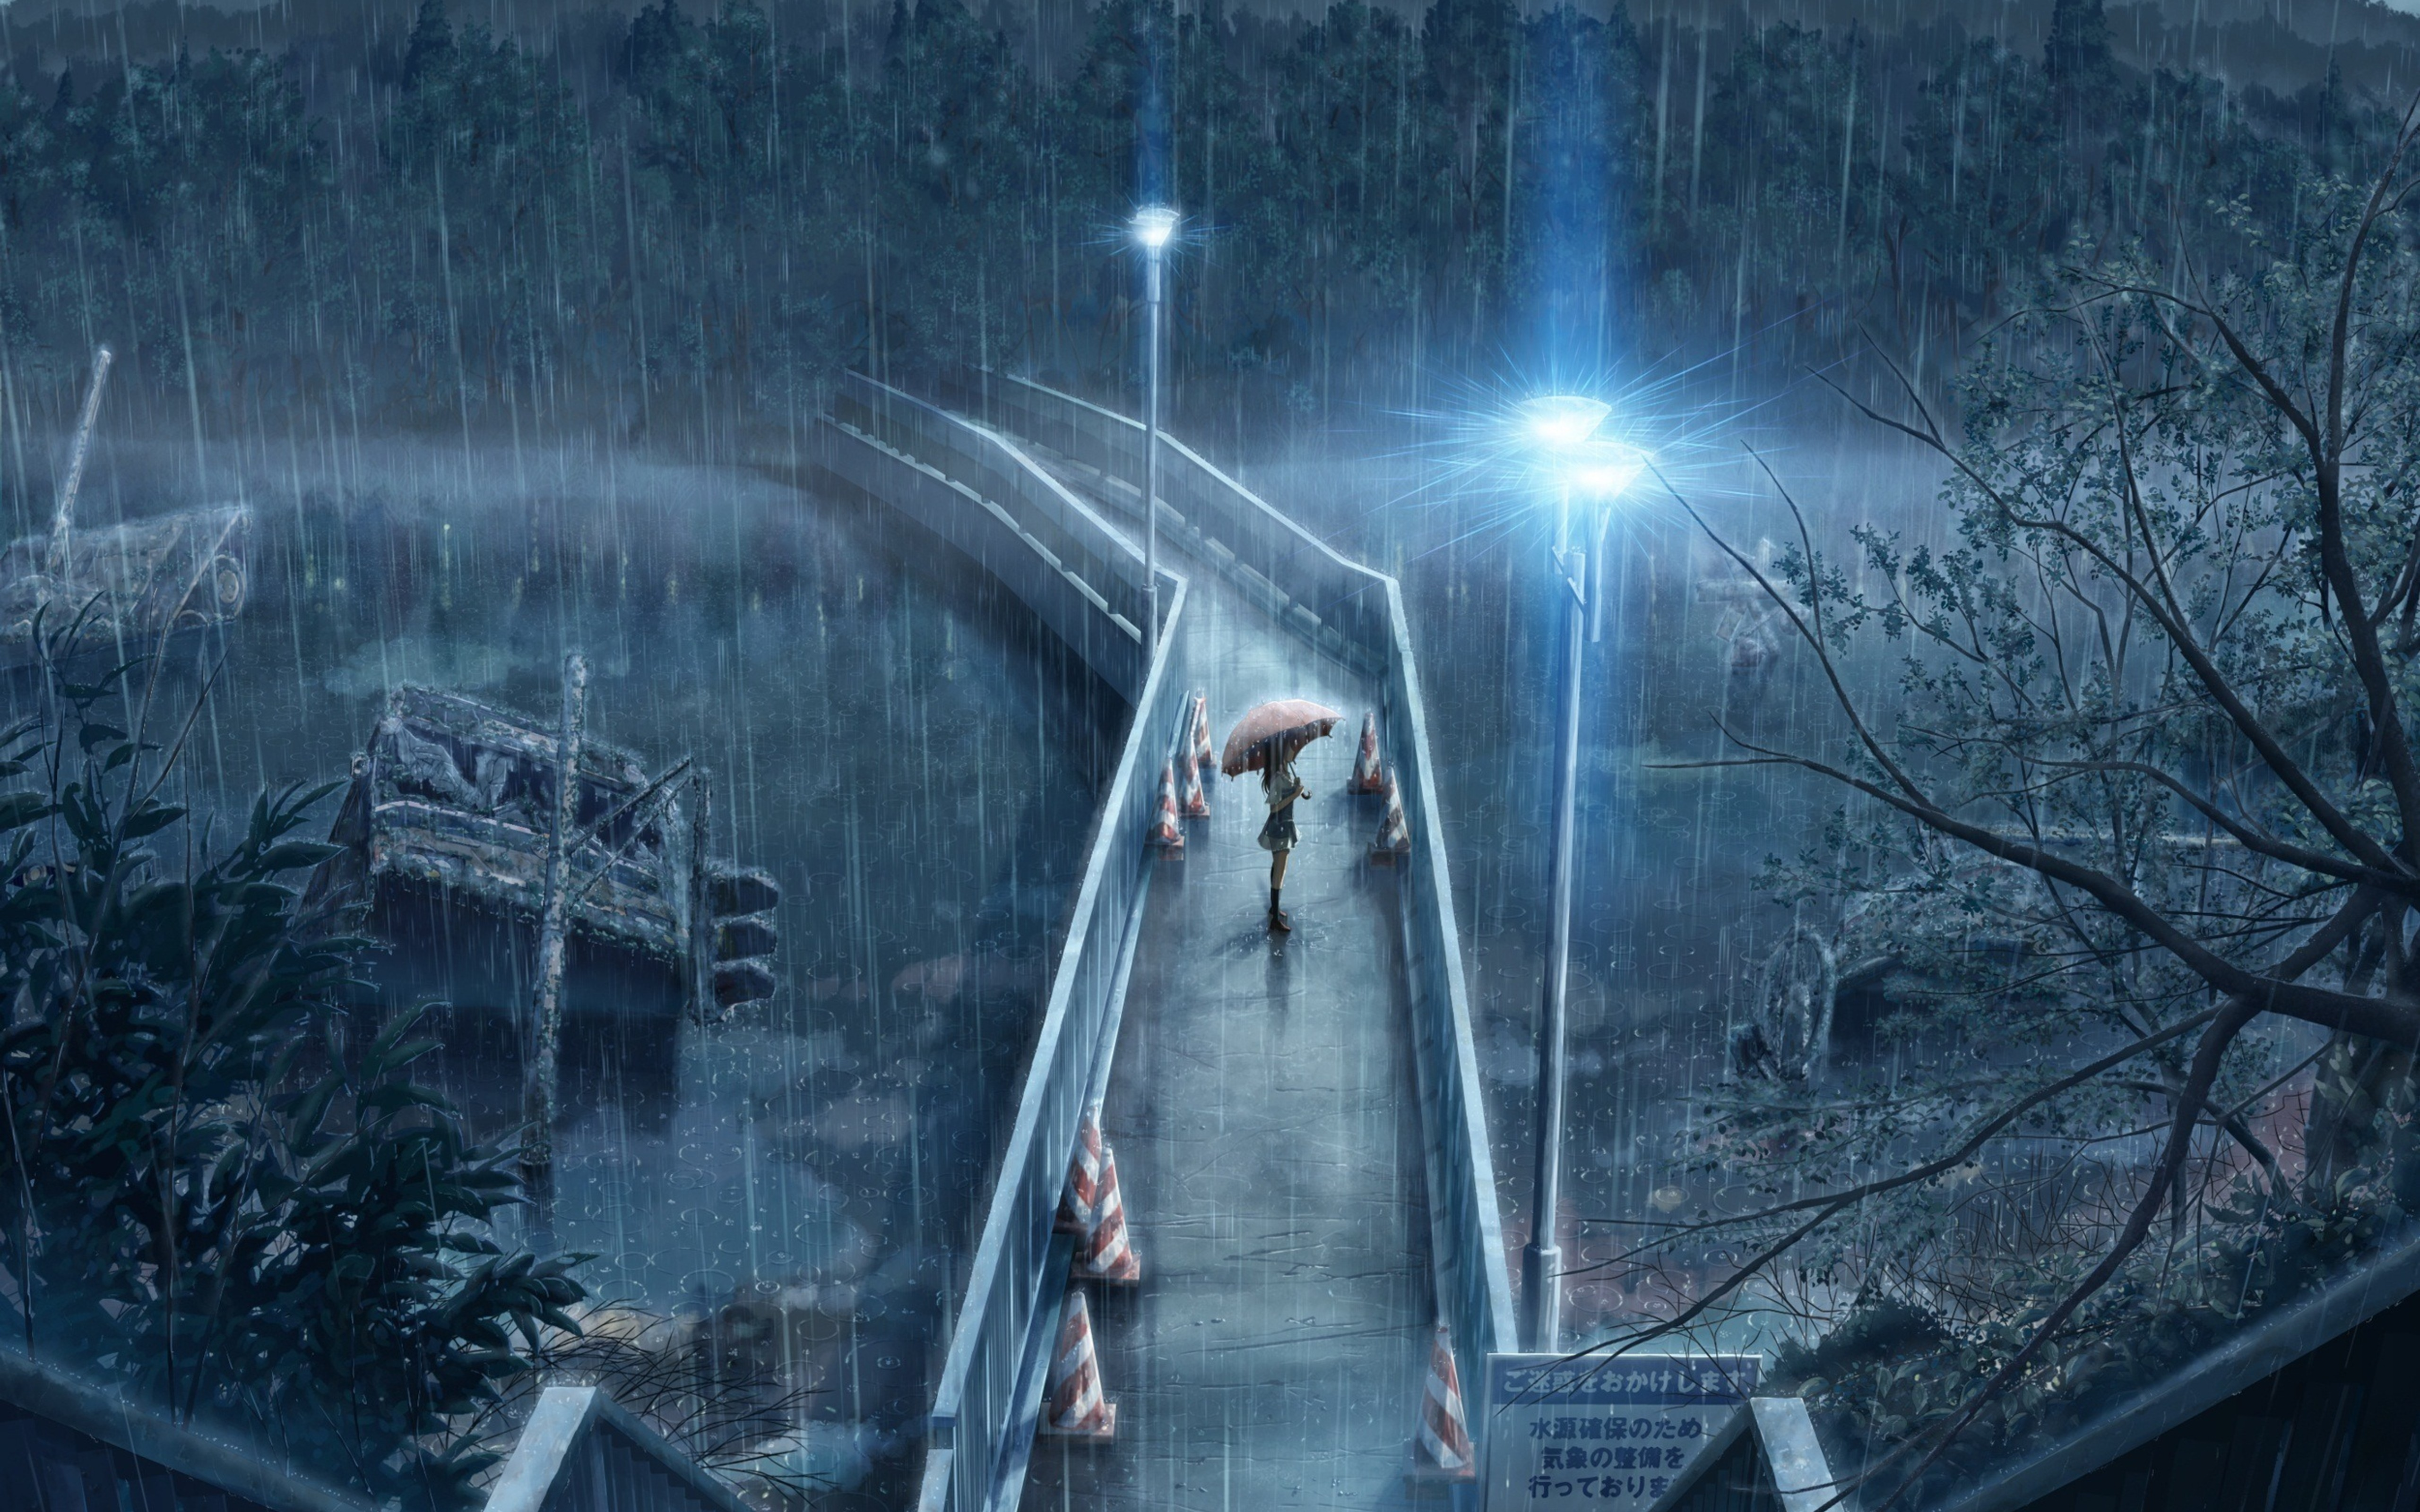 Anime Girl Standing In Rain With Umbrella 5k, HD Anime, 4k ...